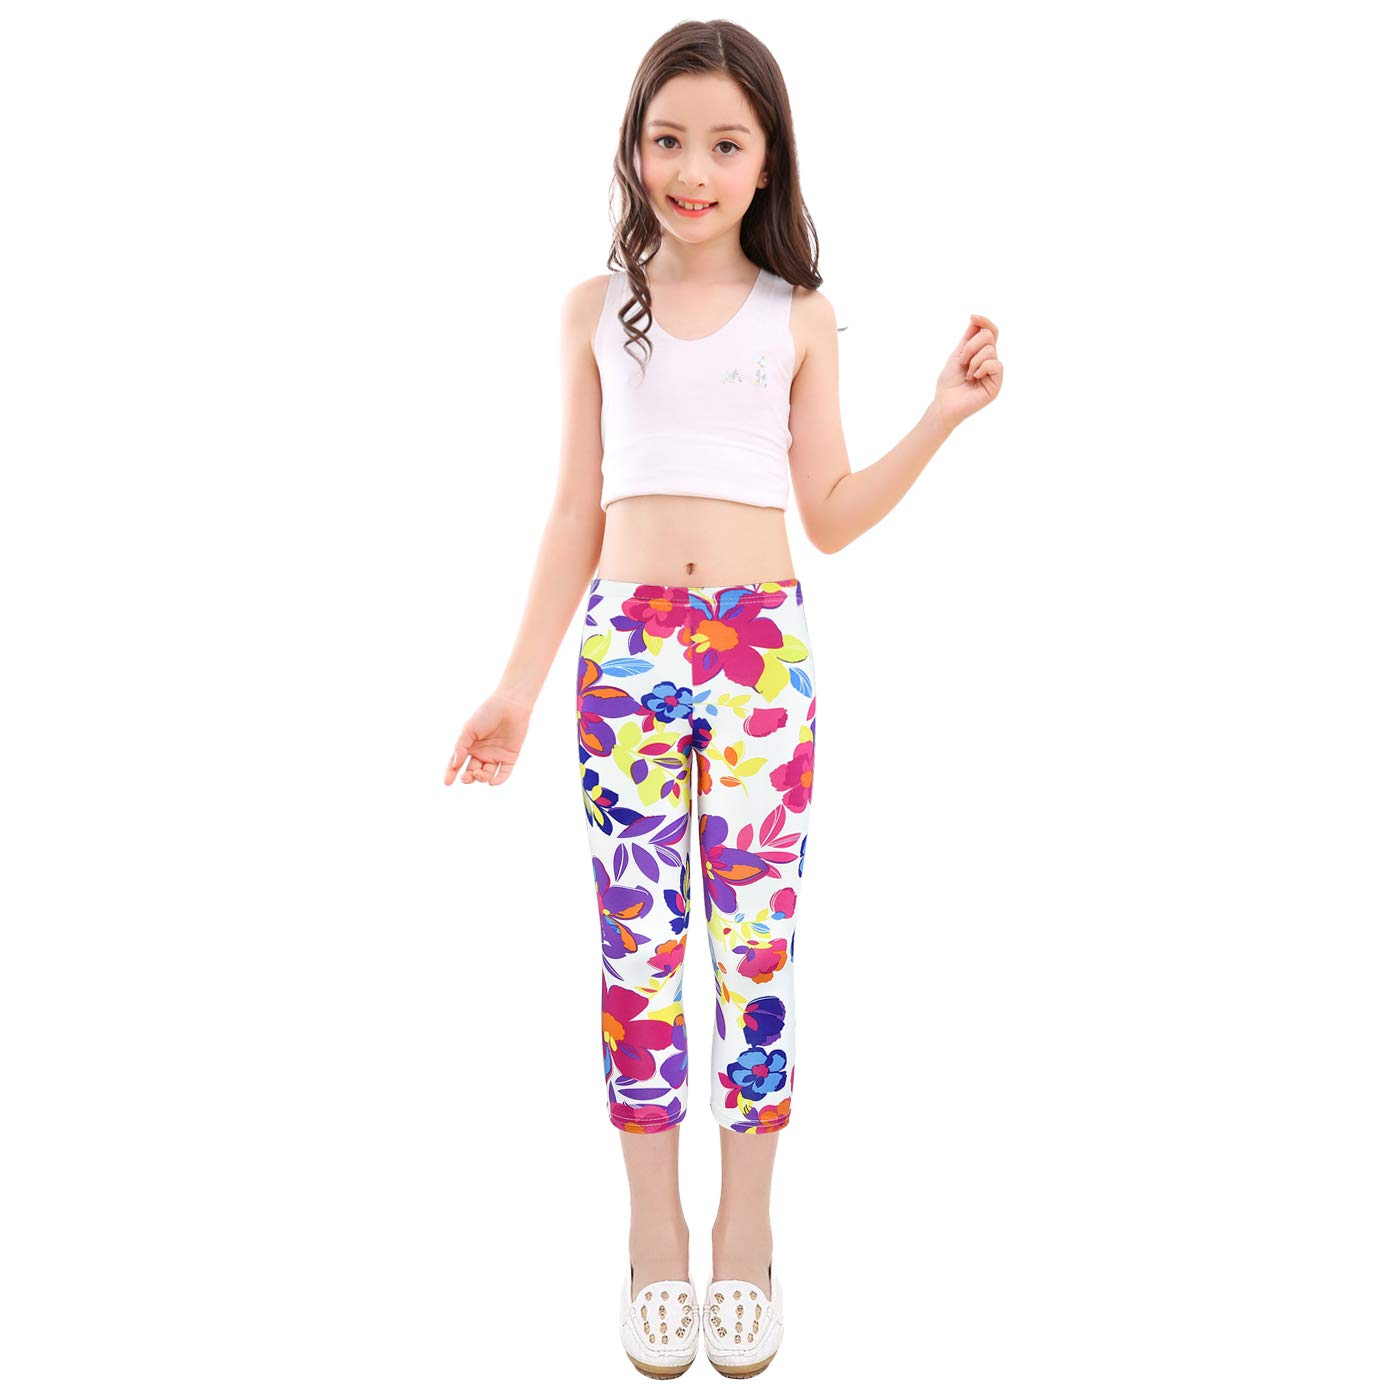 slaixiu 3-Pack Printing Flower Girl Leggings Kids Classic Pants 4-13Y(No.70_SADF_#130)